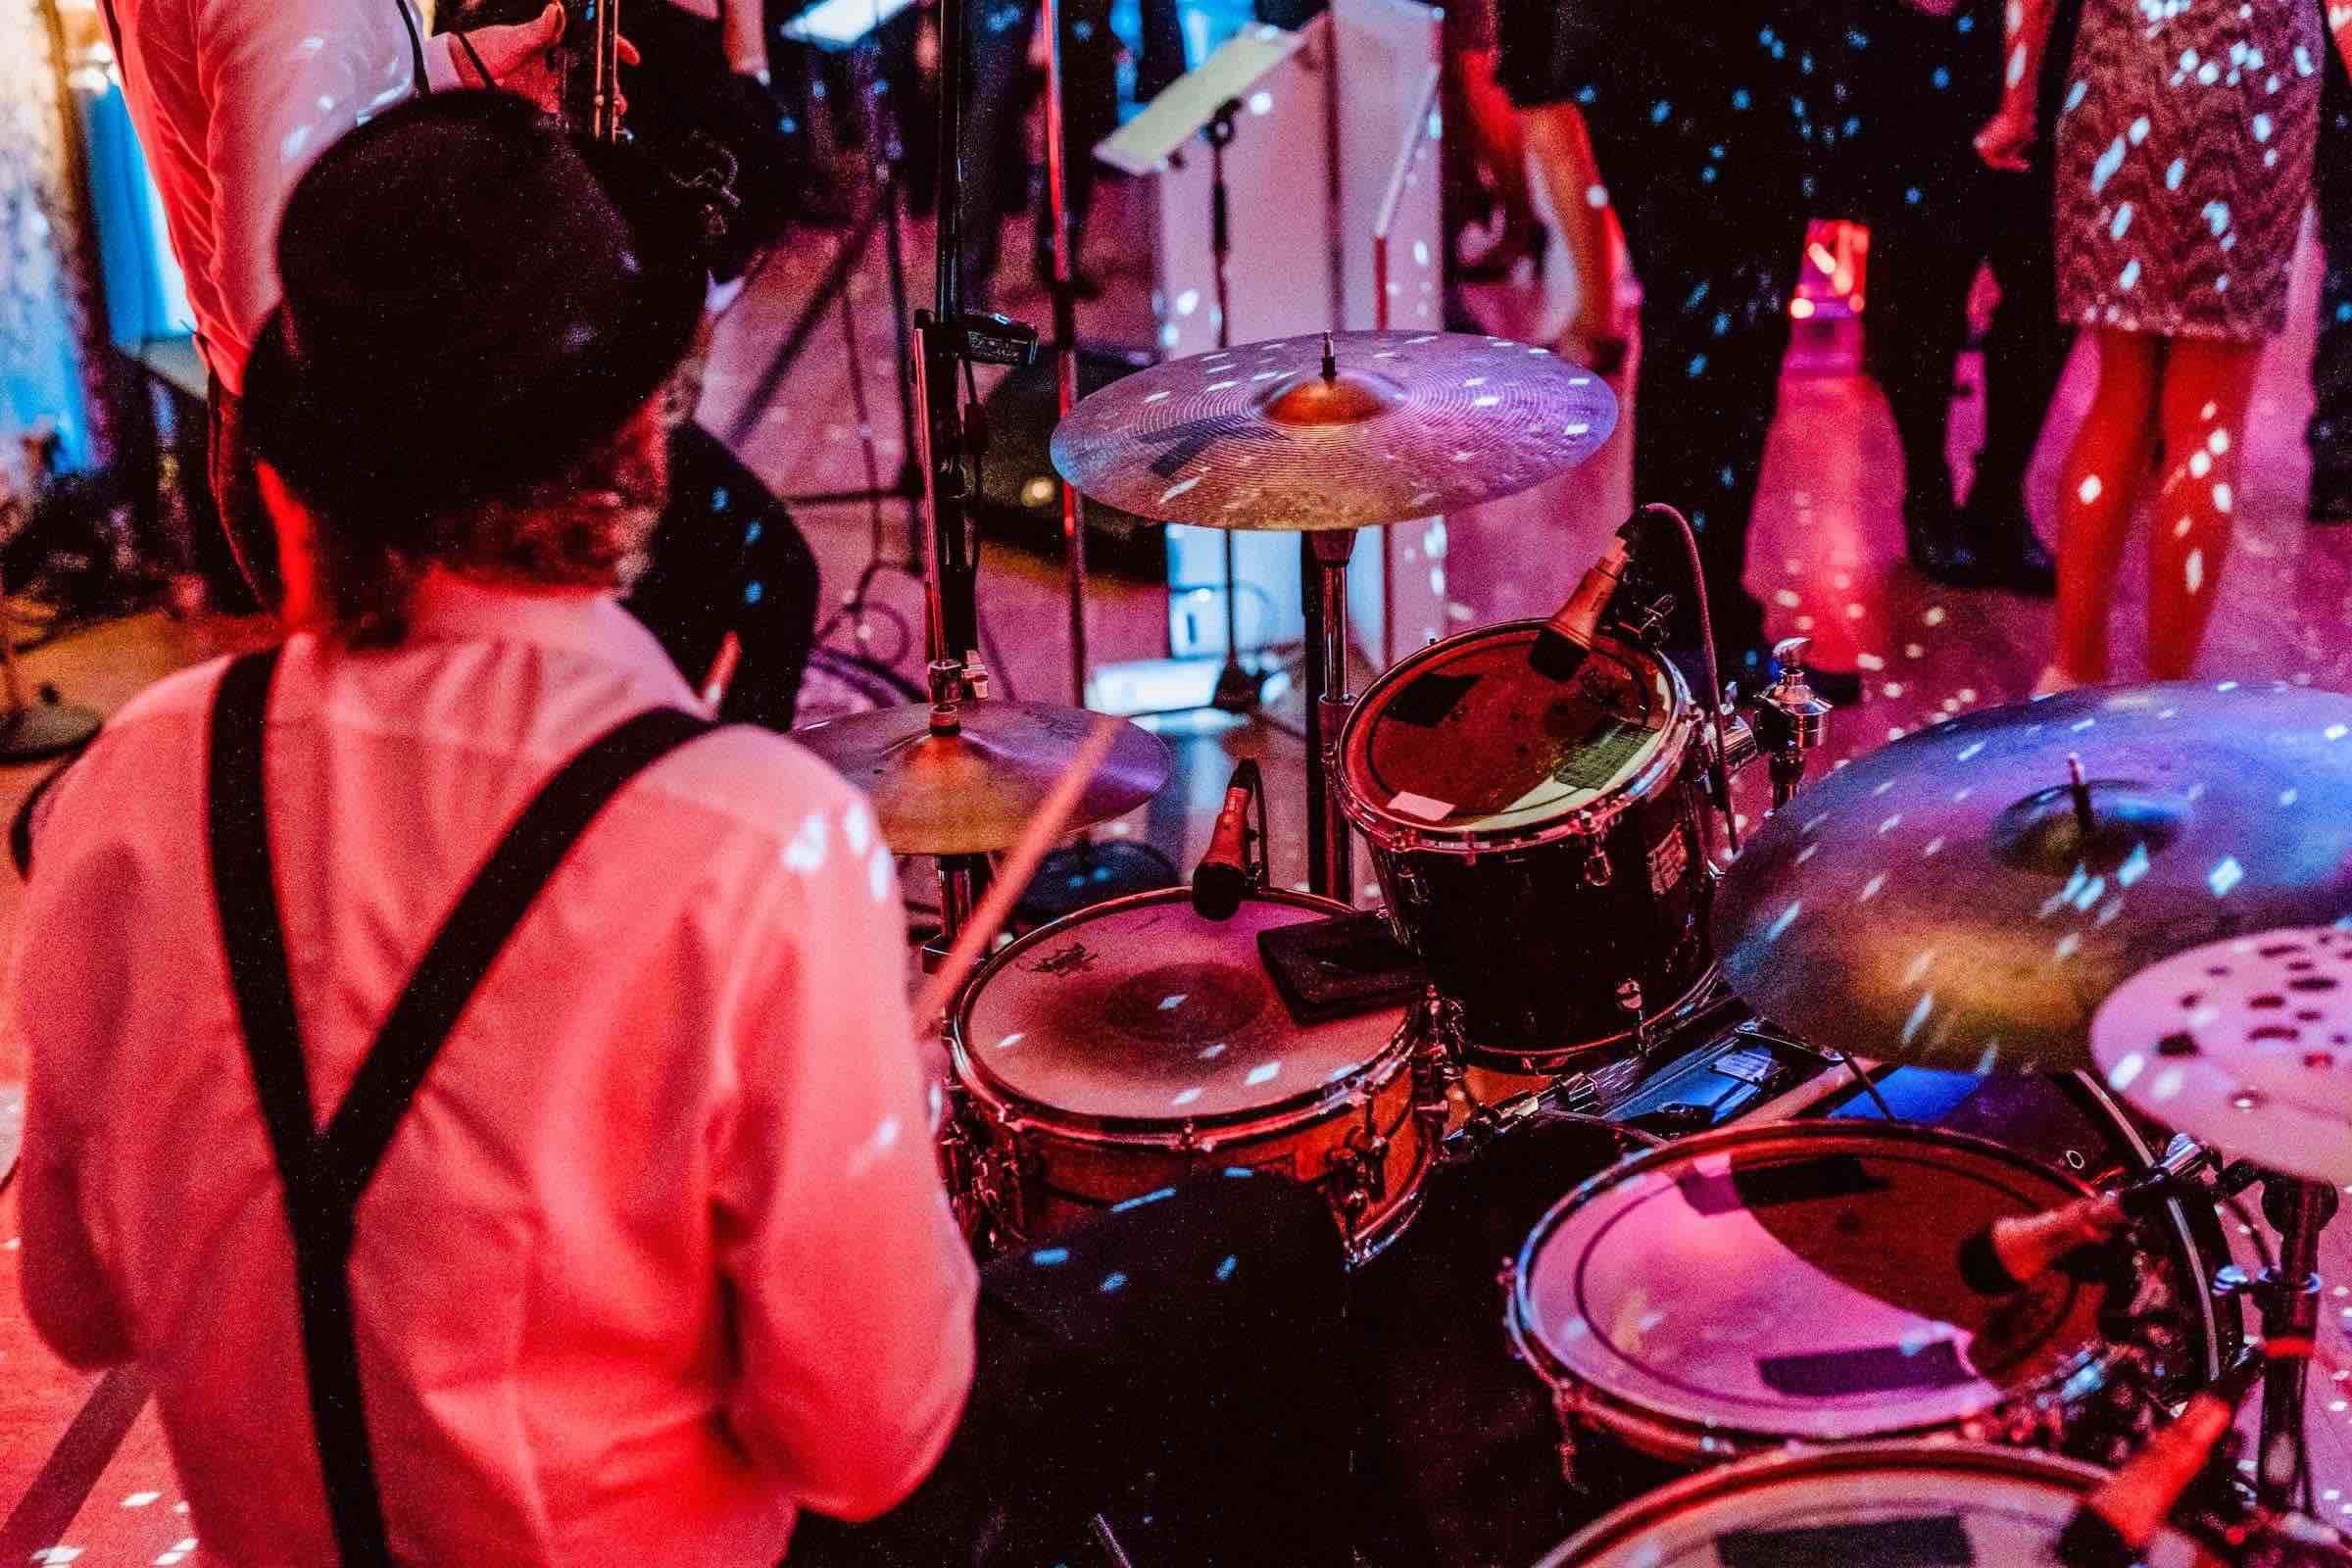 Band | Hamburg | Livemusik | Partyband | Liveband | Swingband | Team | Hochzeitsmesse | Jazzband | Soul | Motown | Schlagzeug | Drums | Swing | Hochzeit | Firmenfeier | Dinner | Empfang | Gala | Charity | Anfragen | Hamburgfeiert